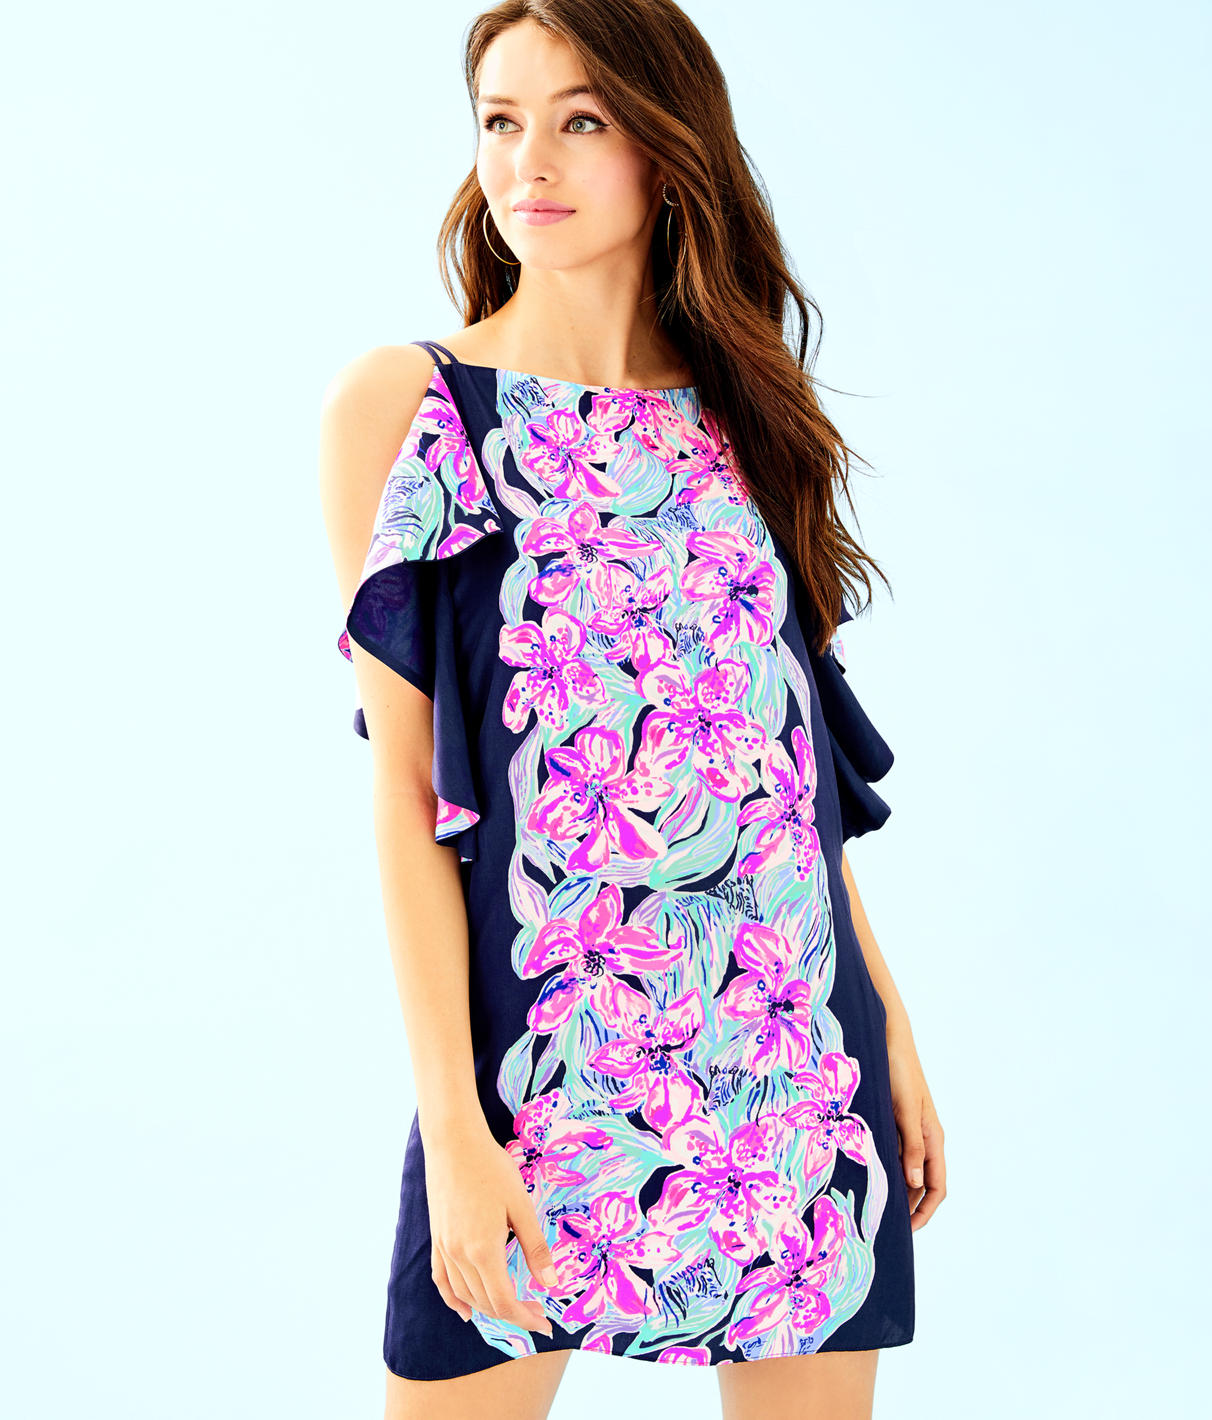 Lilly Pulitzer Kara Dress